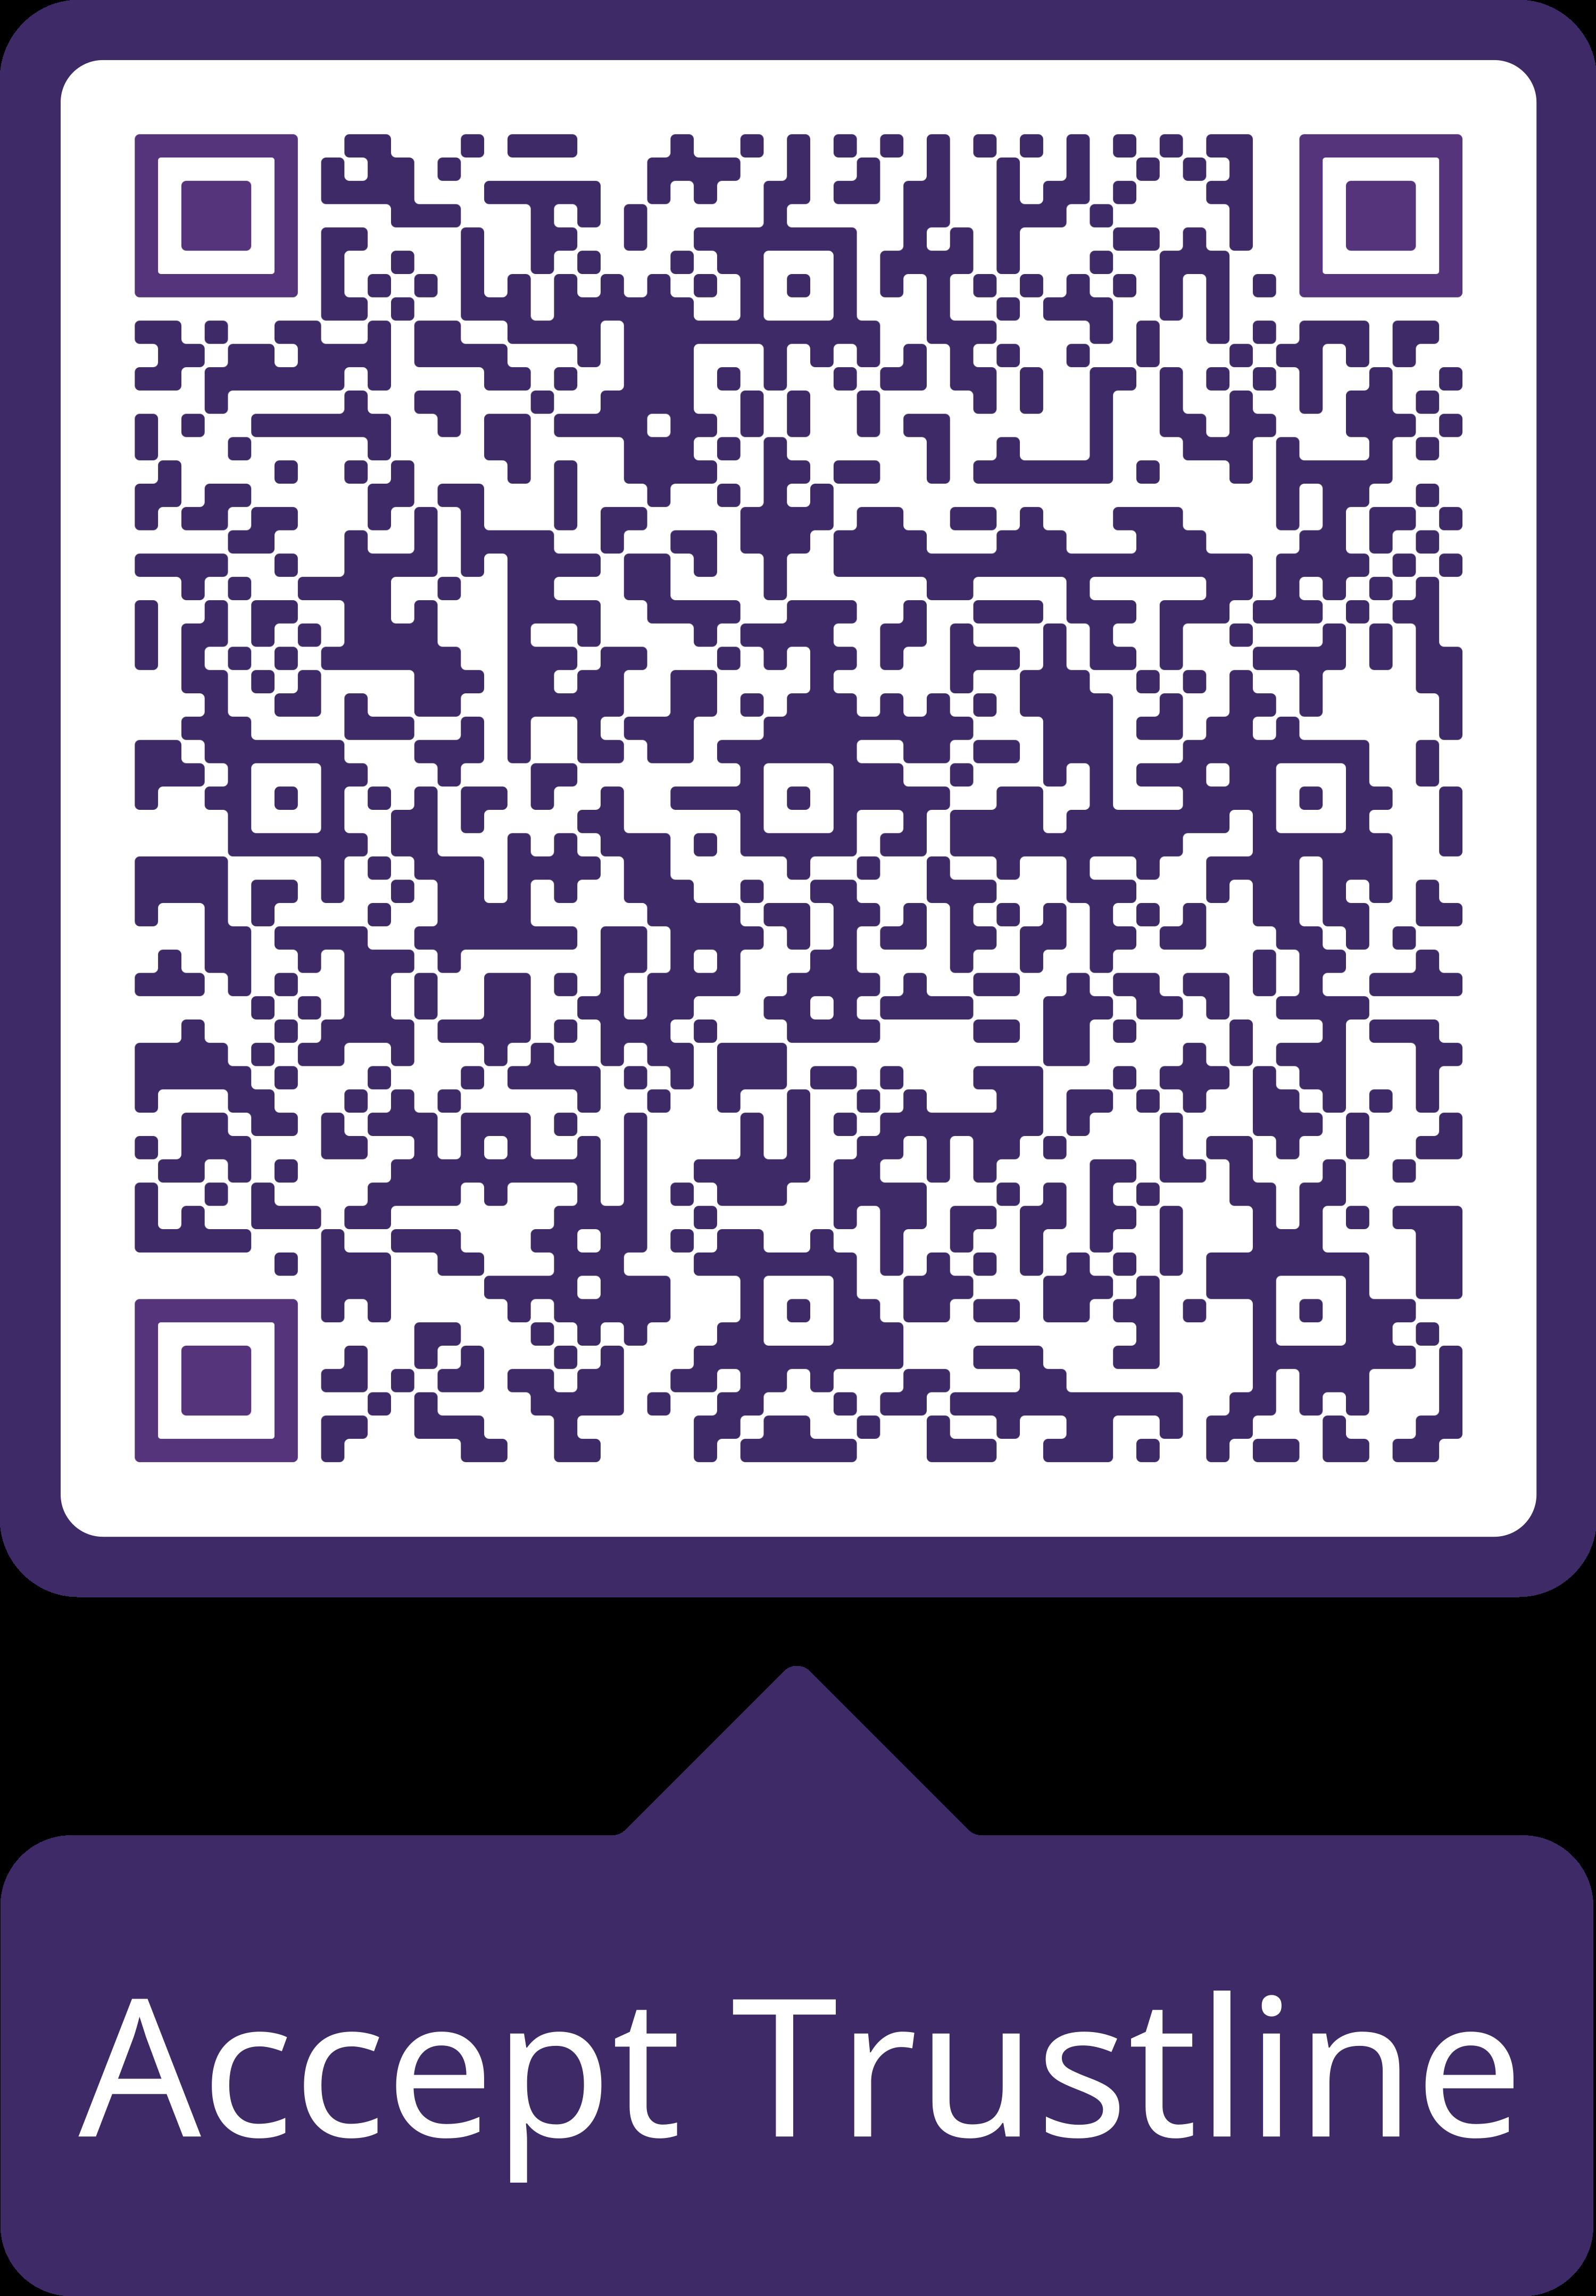 QR Code Image